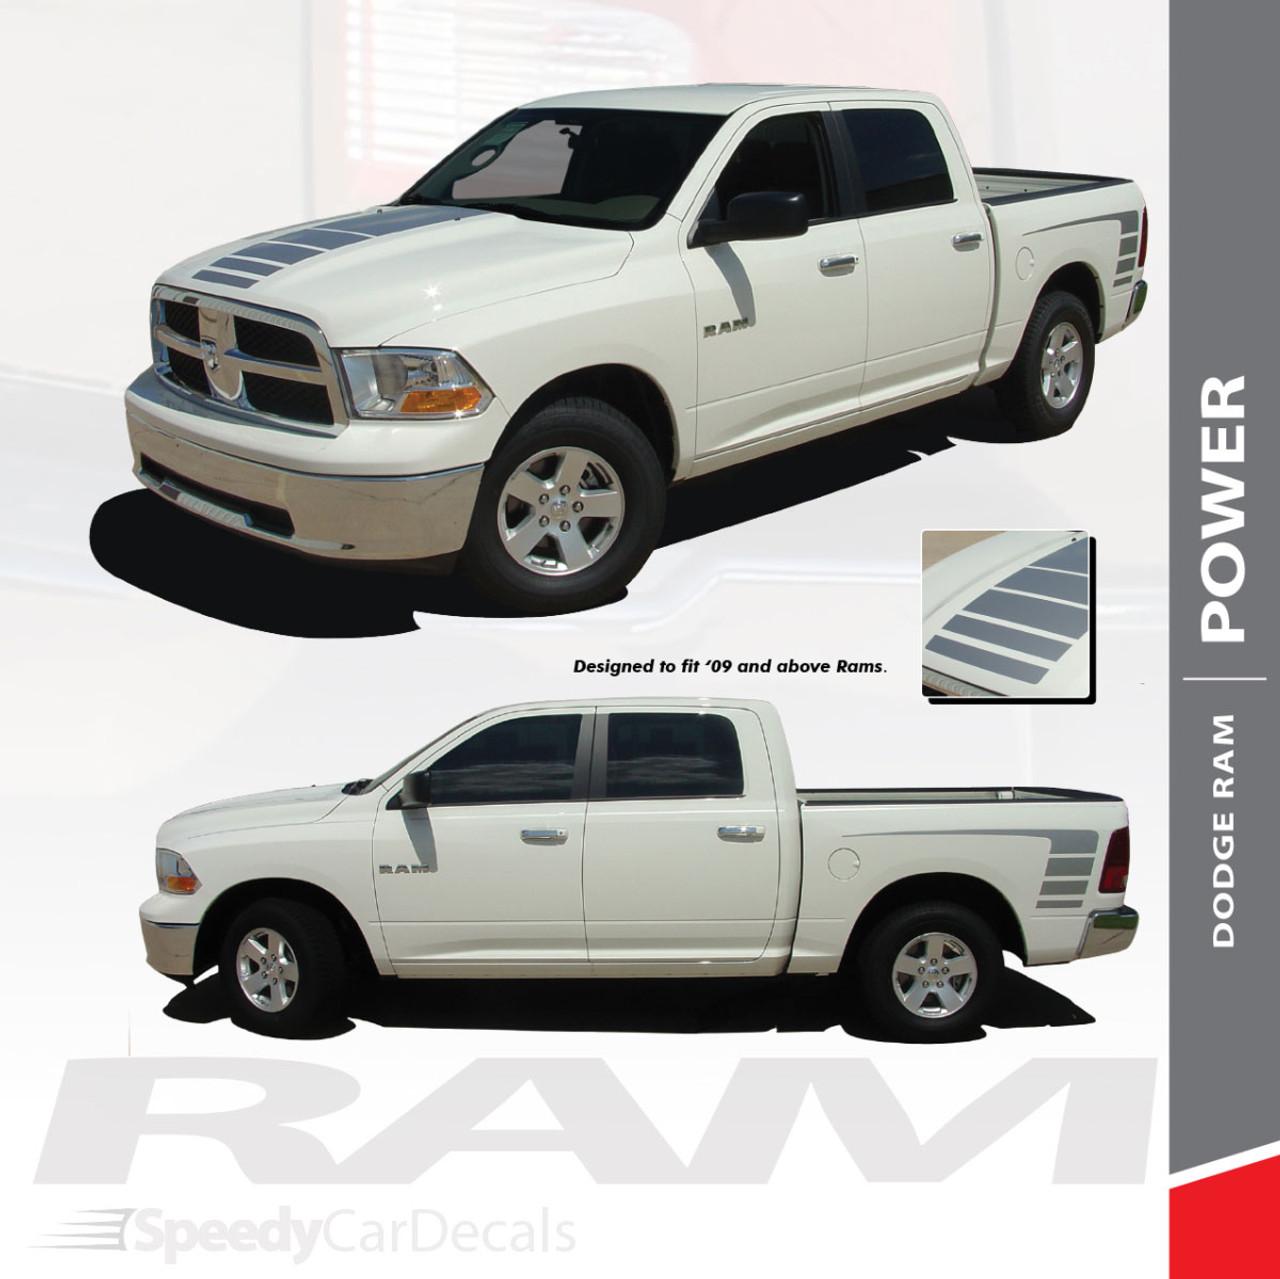 Power Dodge Ram Power Wagon Decals Vinyl Graphics 3m 2009 2018 Premium And Supreme Install Speedycardecals Fast Car Decals Auto Decals Auto Stripes Vehicle Specific Graphics